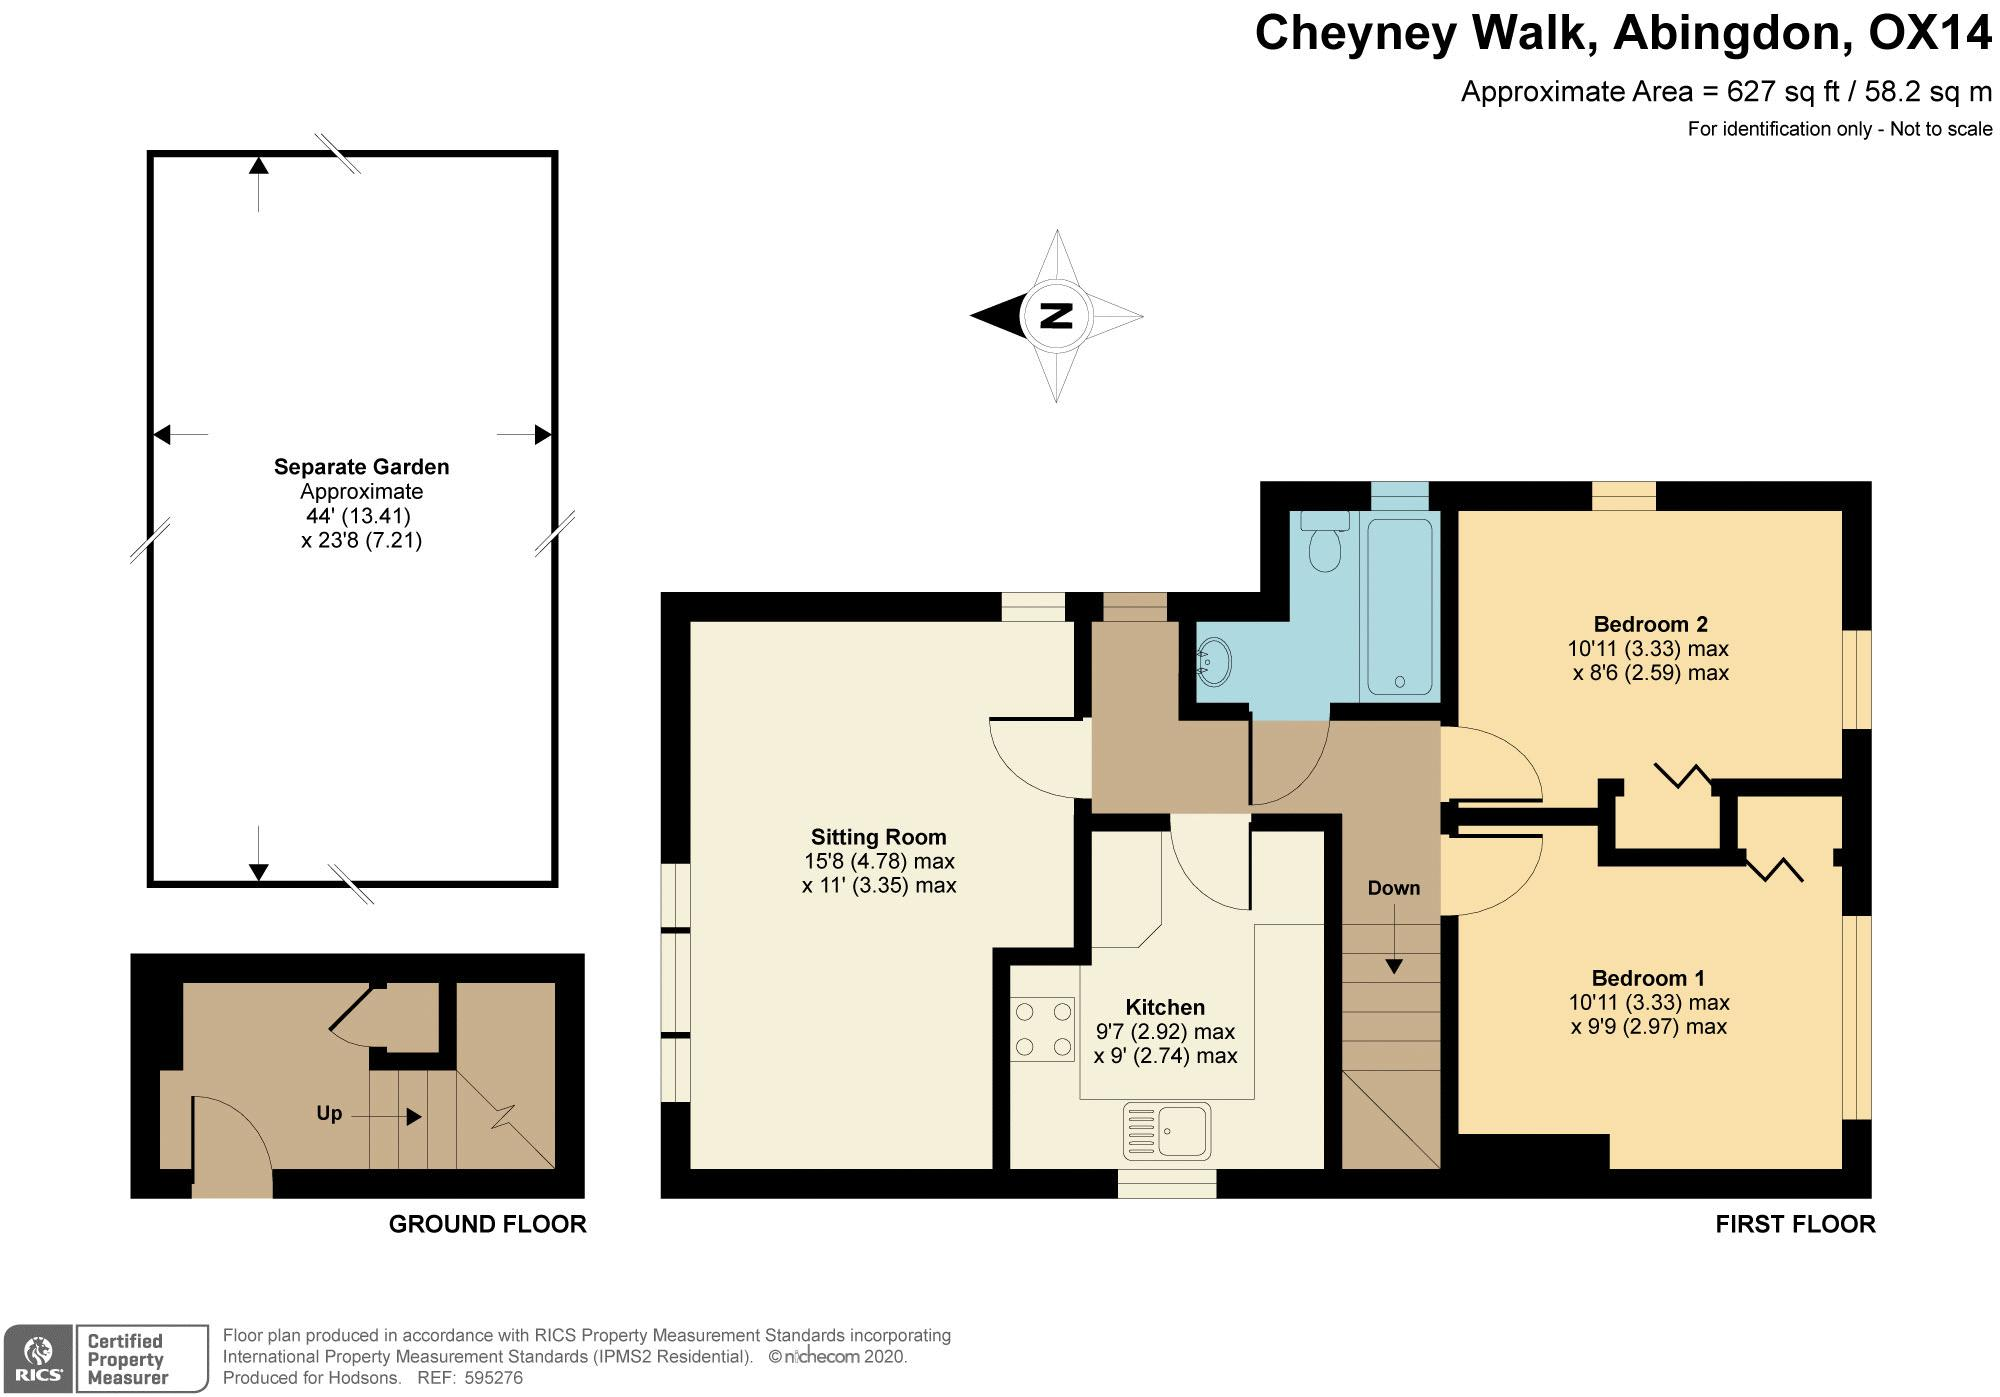 Cheyney Walk